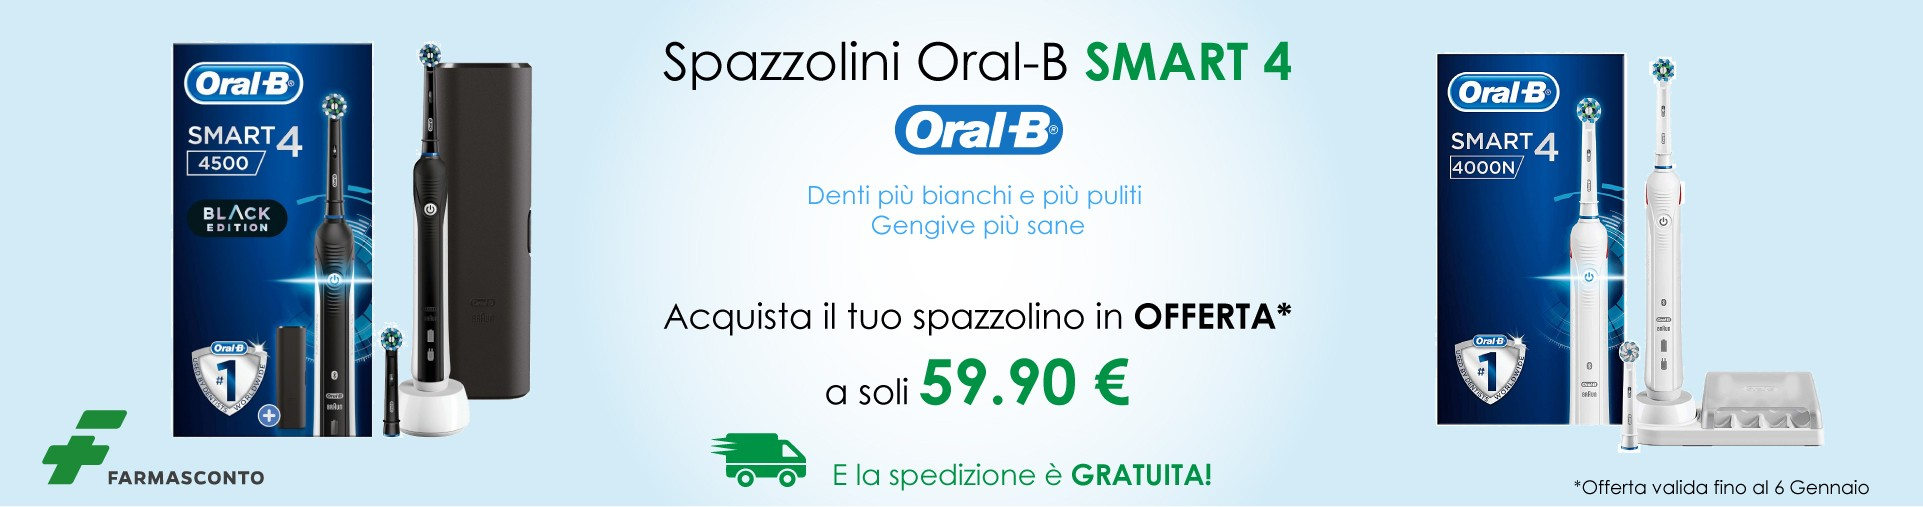 Spazzolini Oral-B